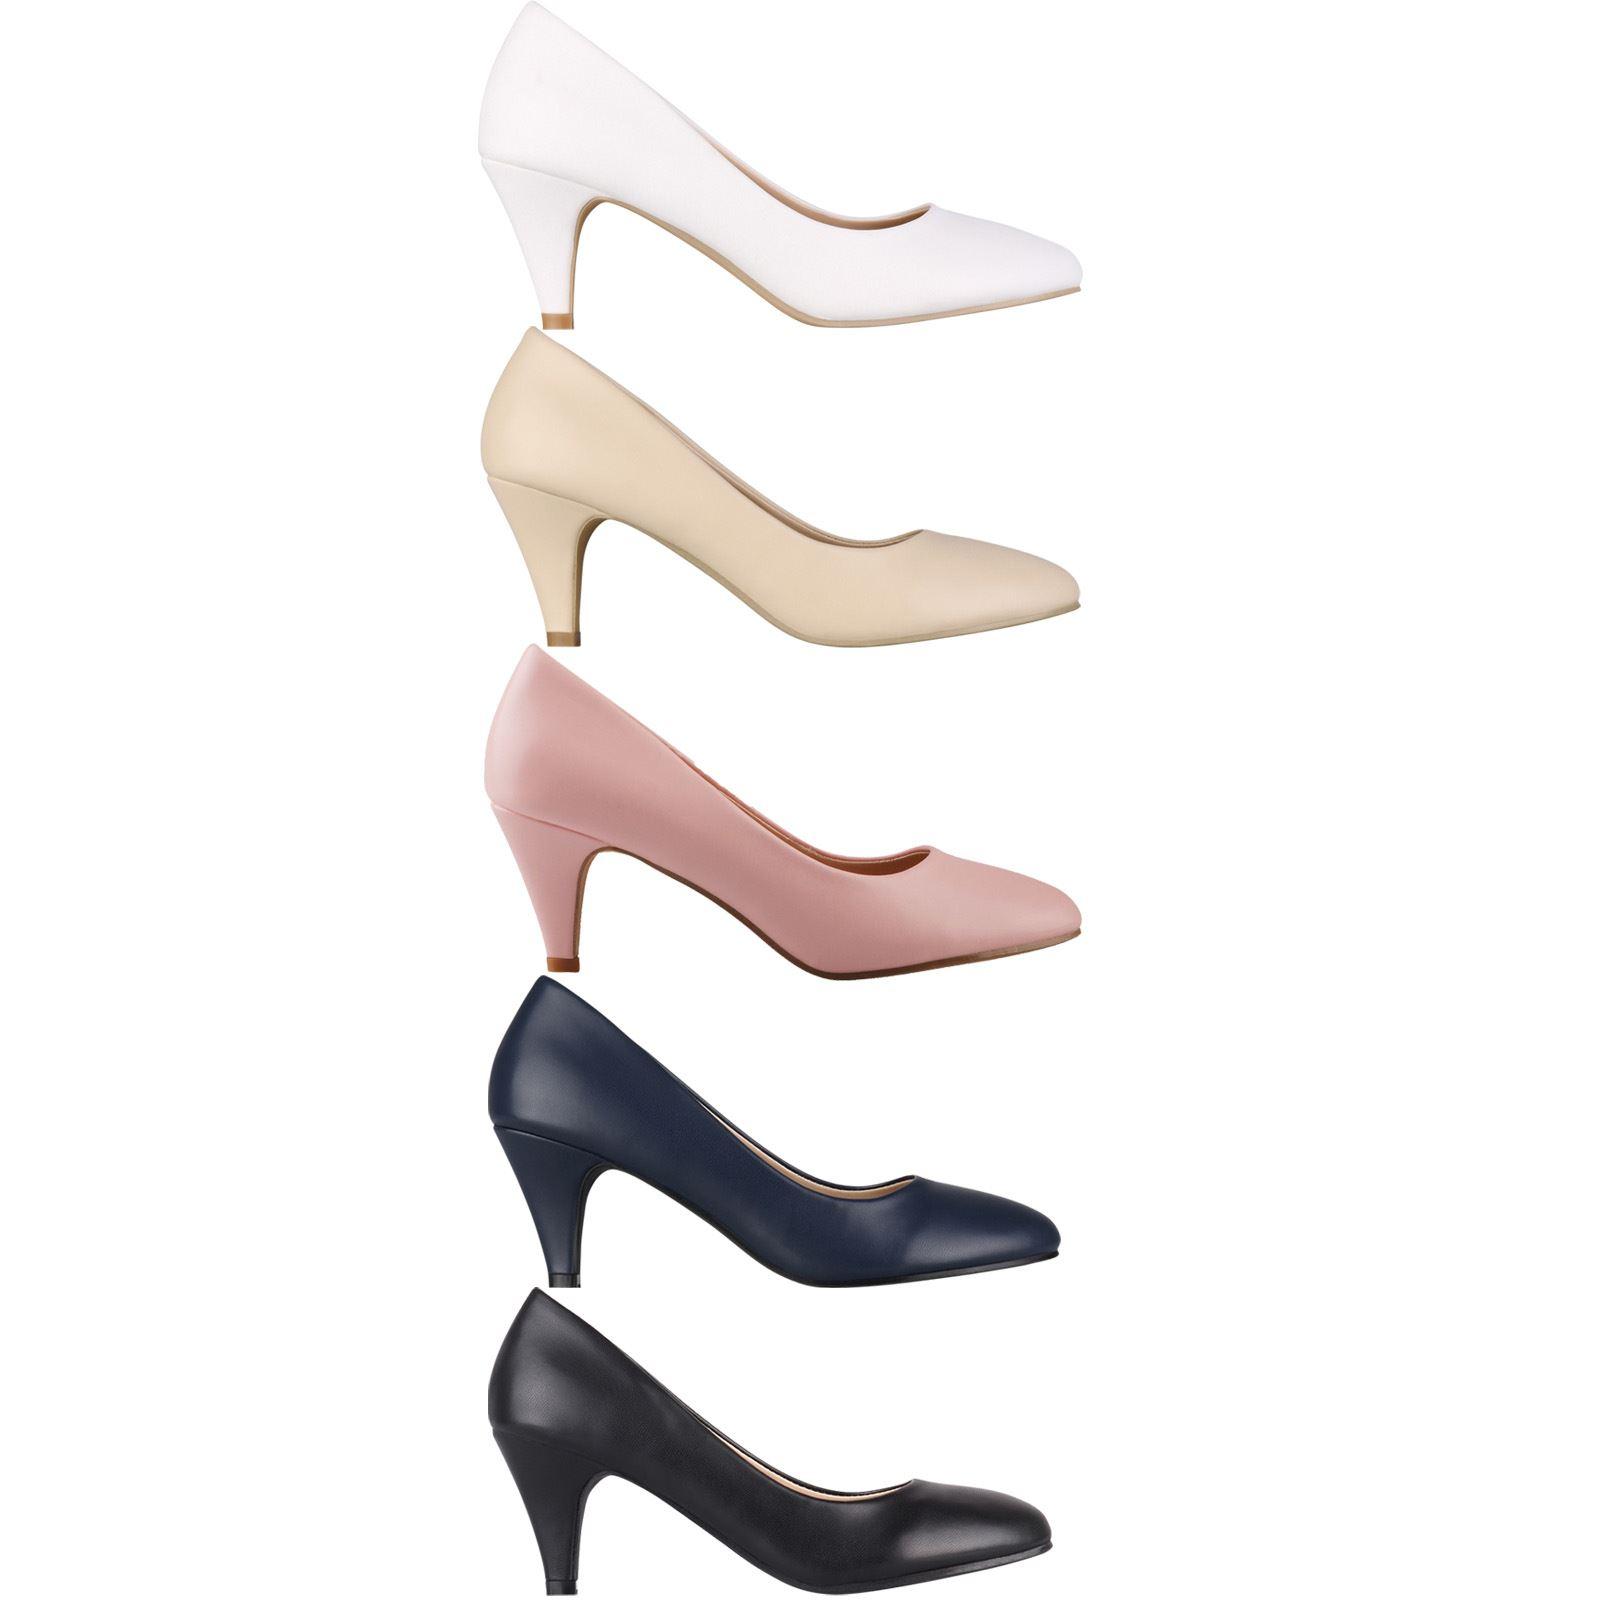 96cf8a3c61 Details about Women Low Mid Kitten Heels Slip On Court Shoes Ladies Pumps  Work Office Size 3-8